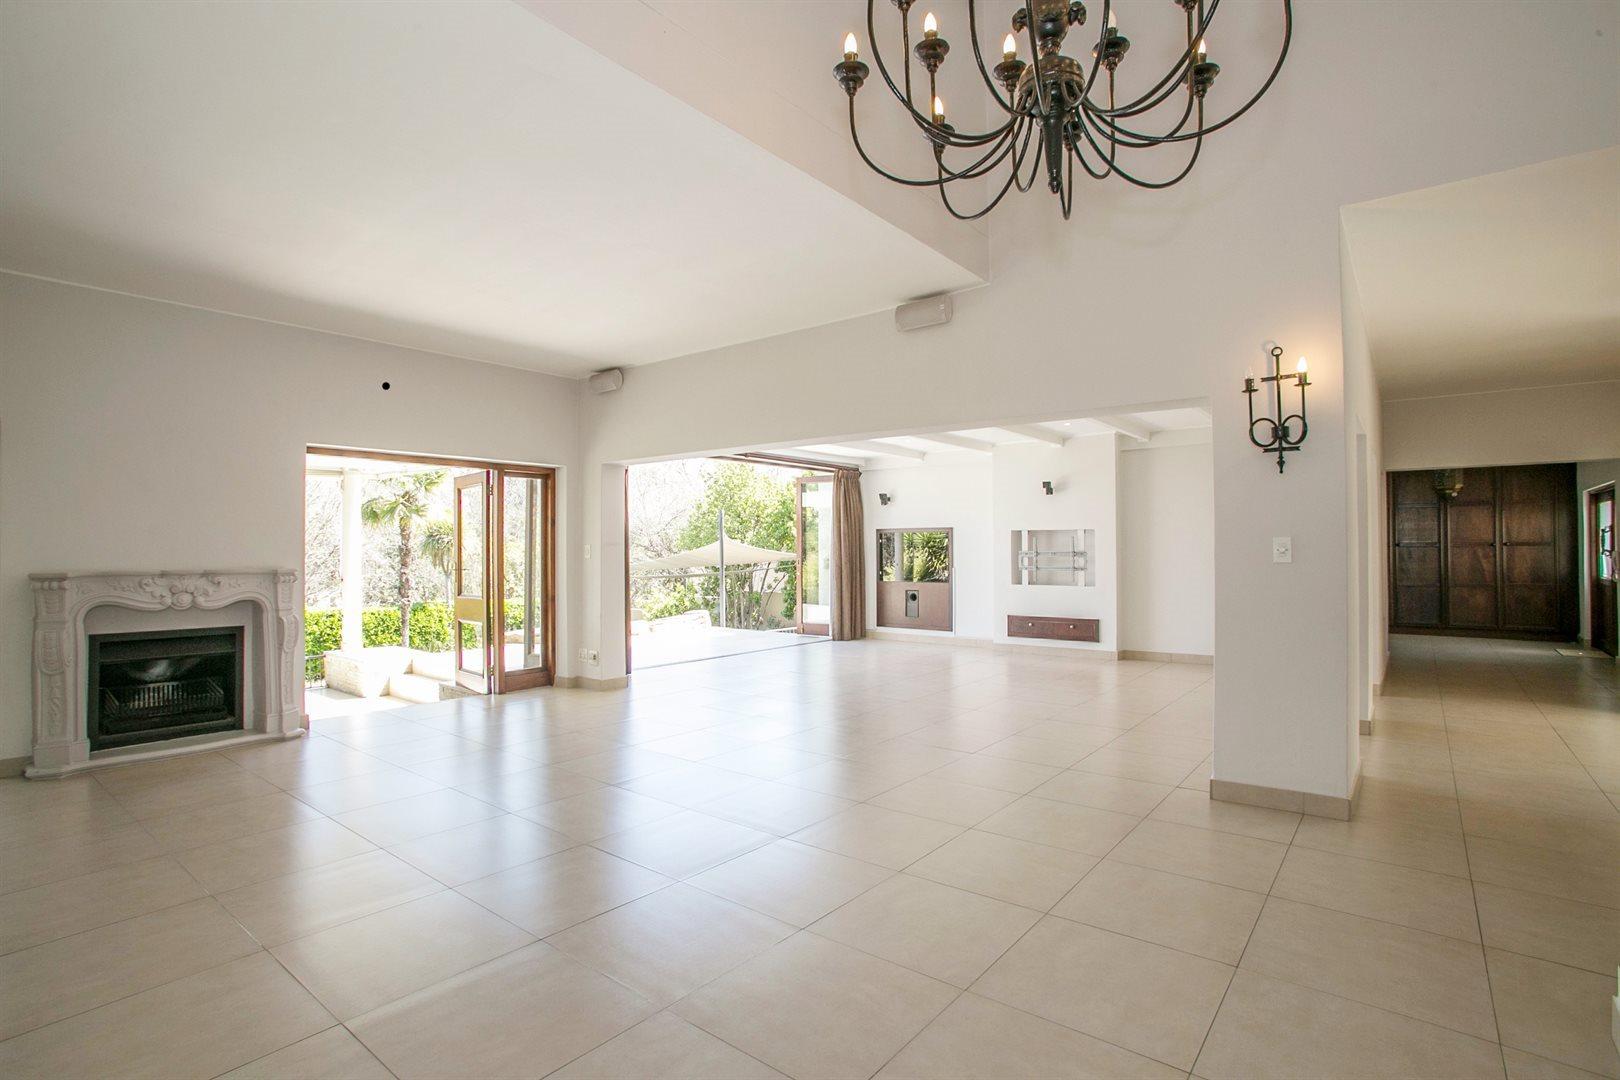 Dainfern Golf Estate property for sale. Ref No: 13381182. Picture no 4